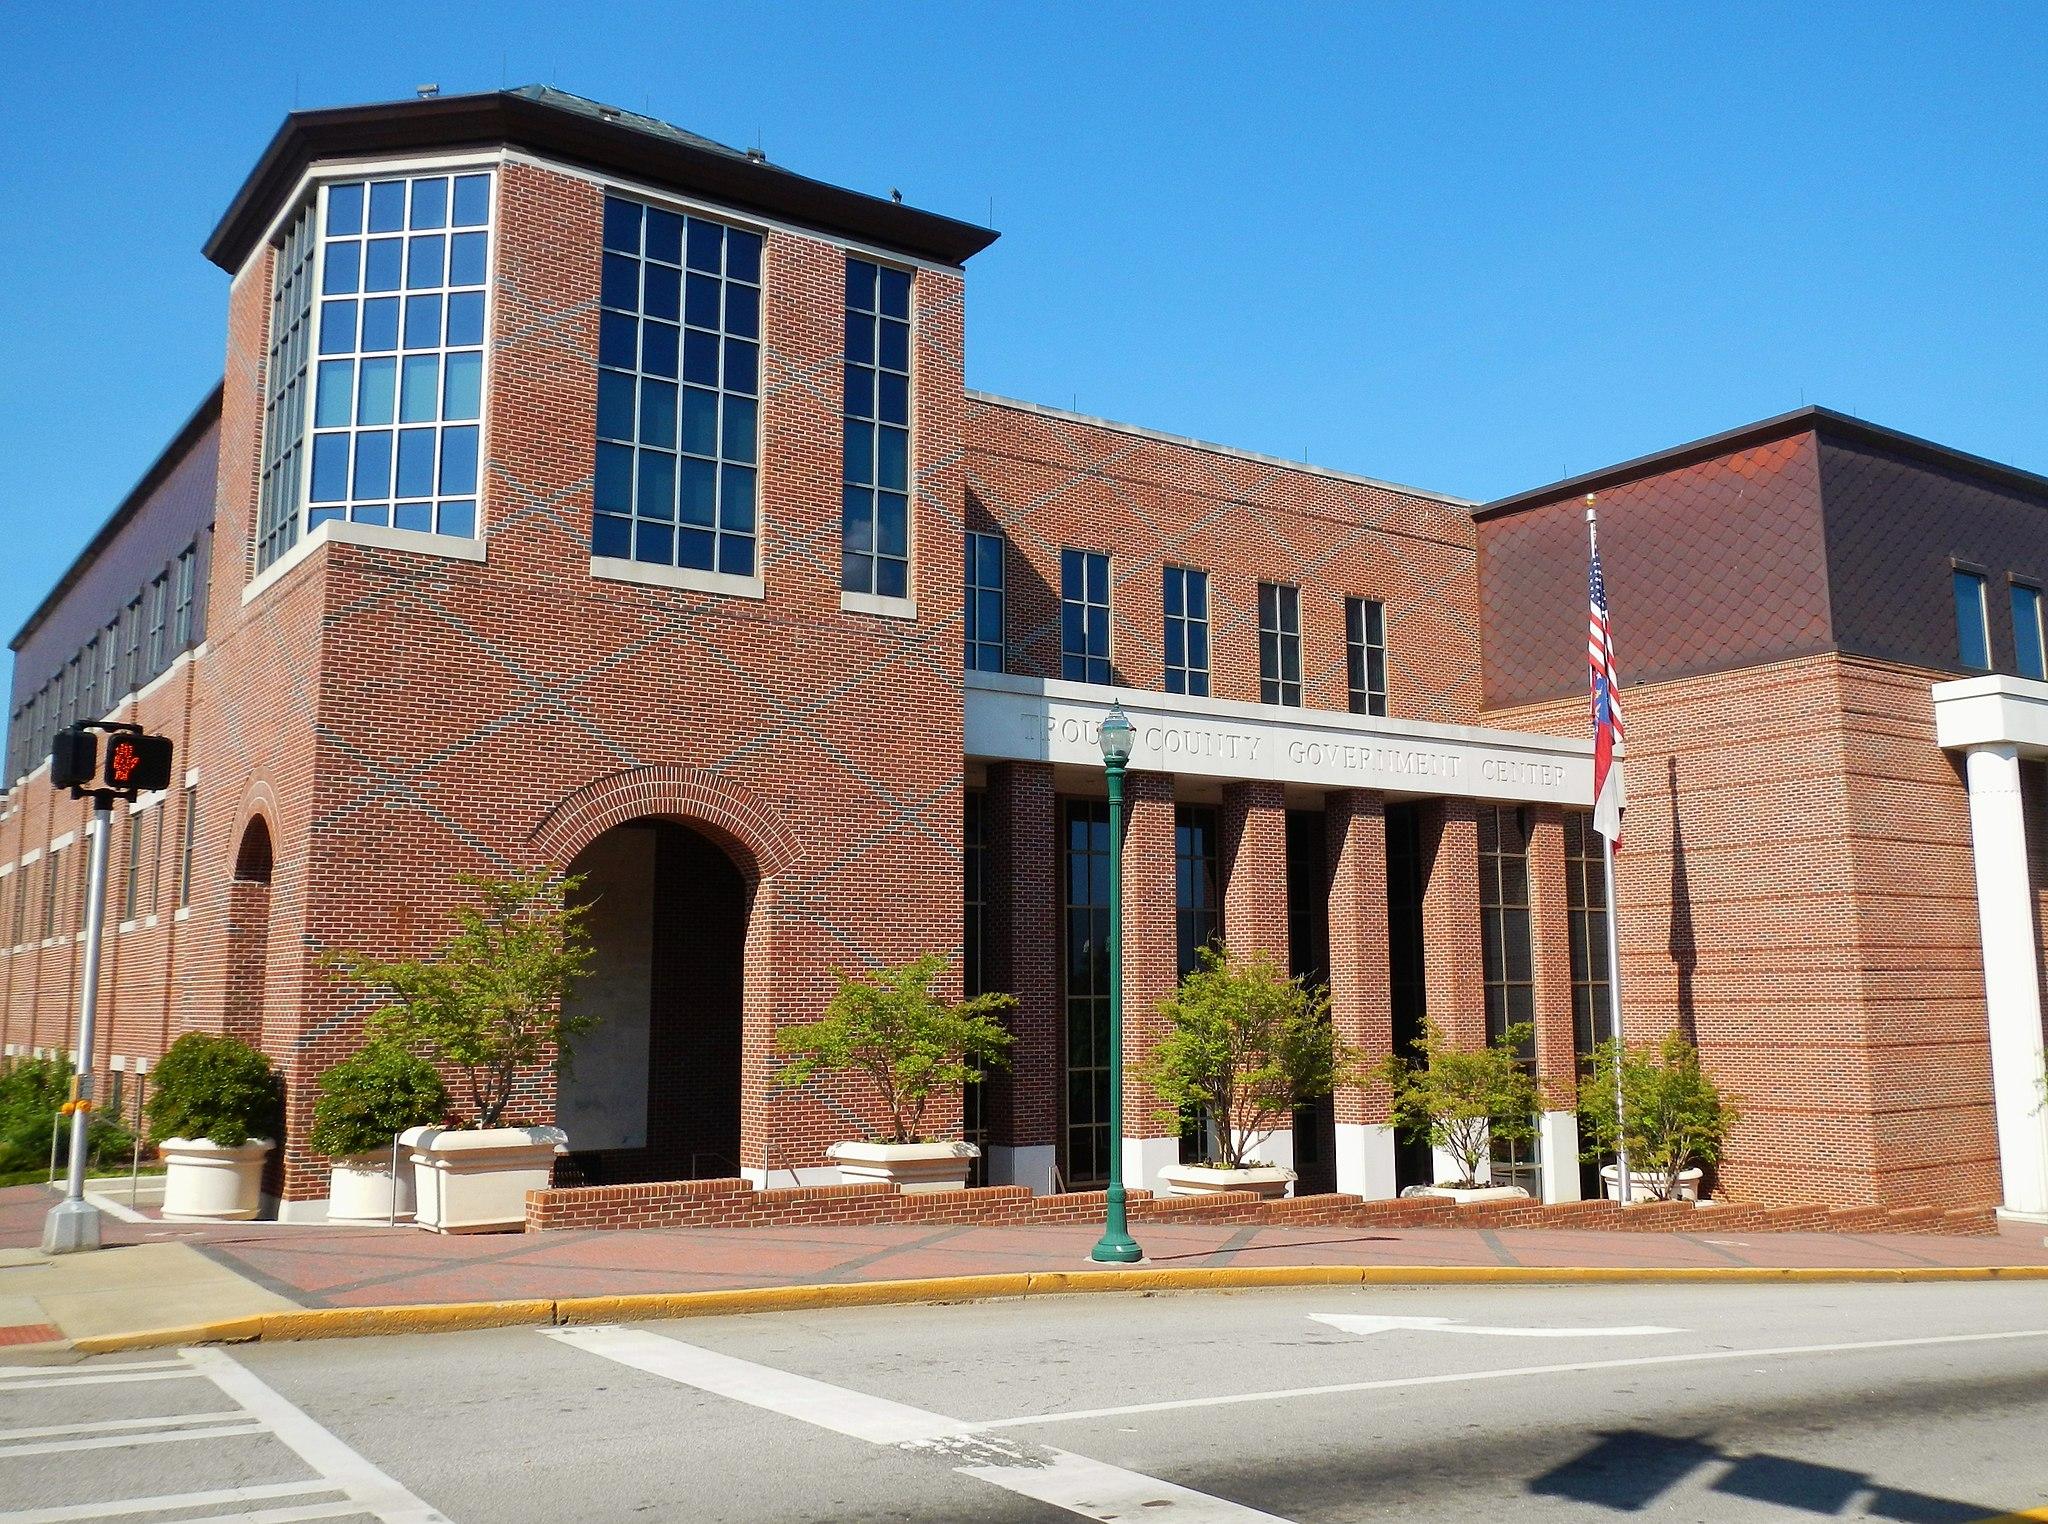 Troup County Georgia Government Center